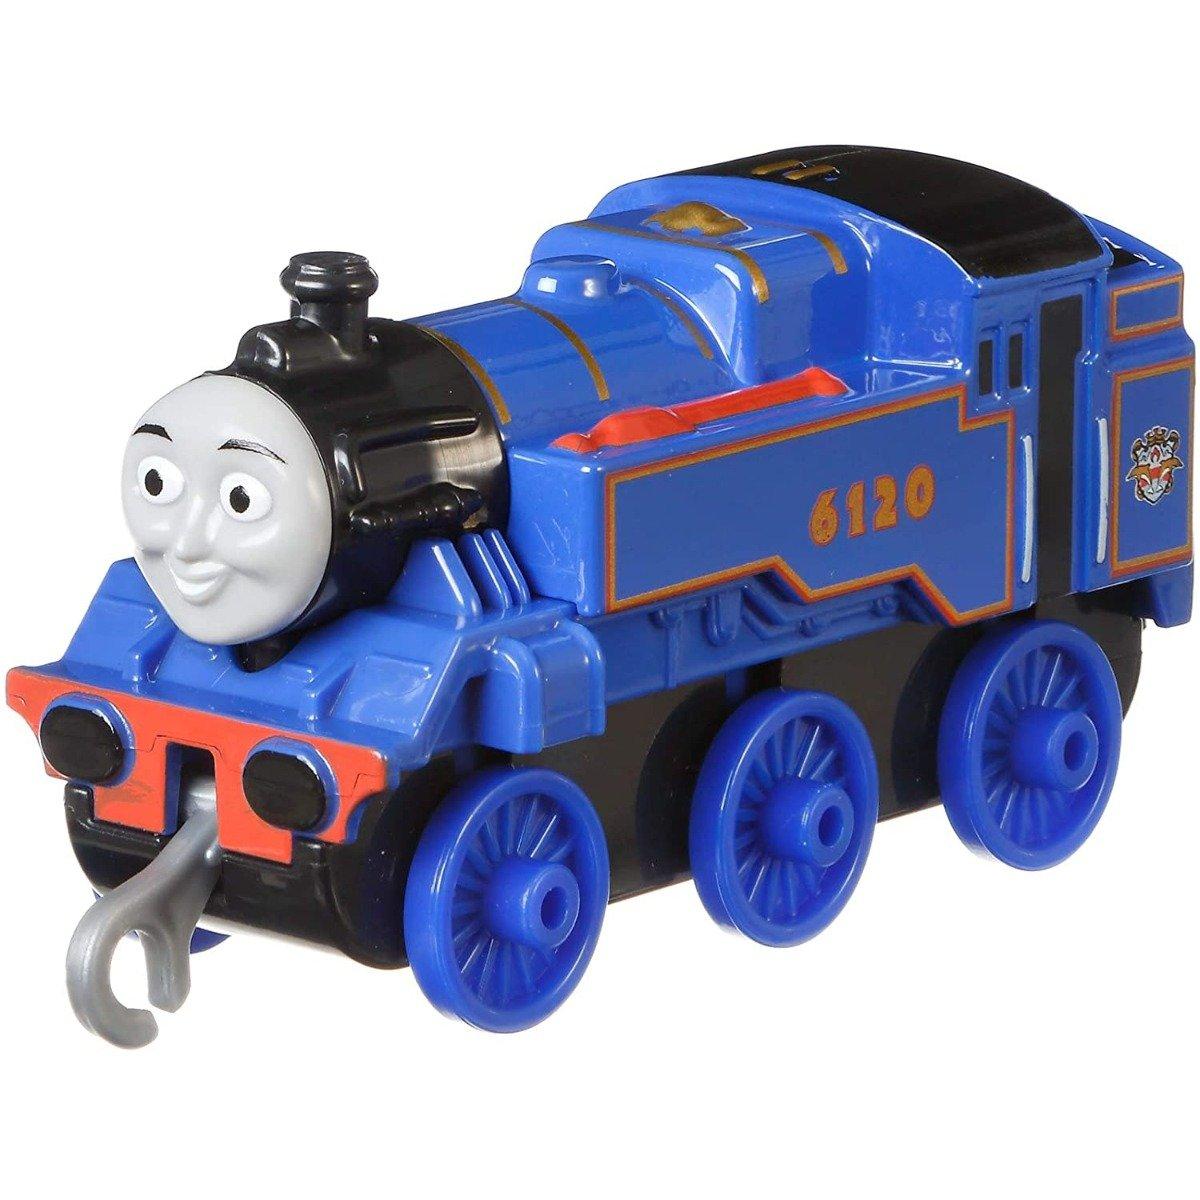 Locomotiva Thomas and Friends, Belle GDJ56